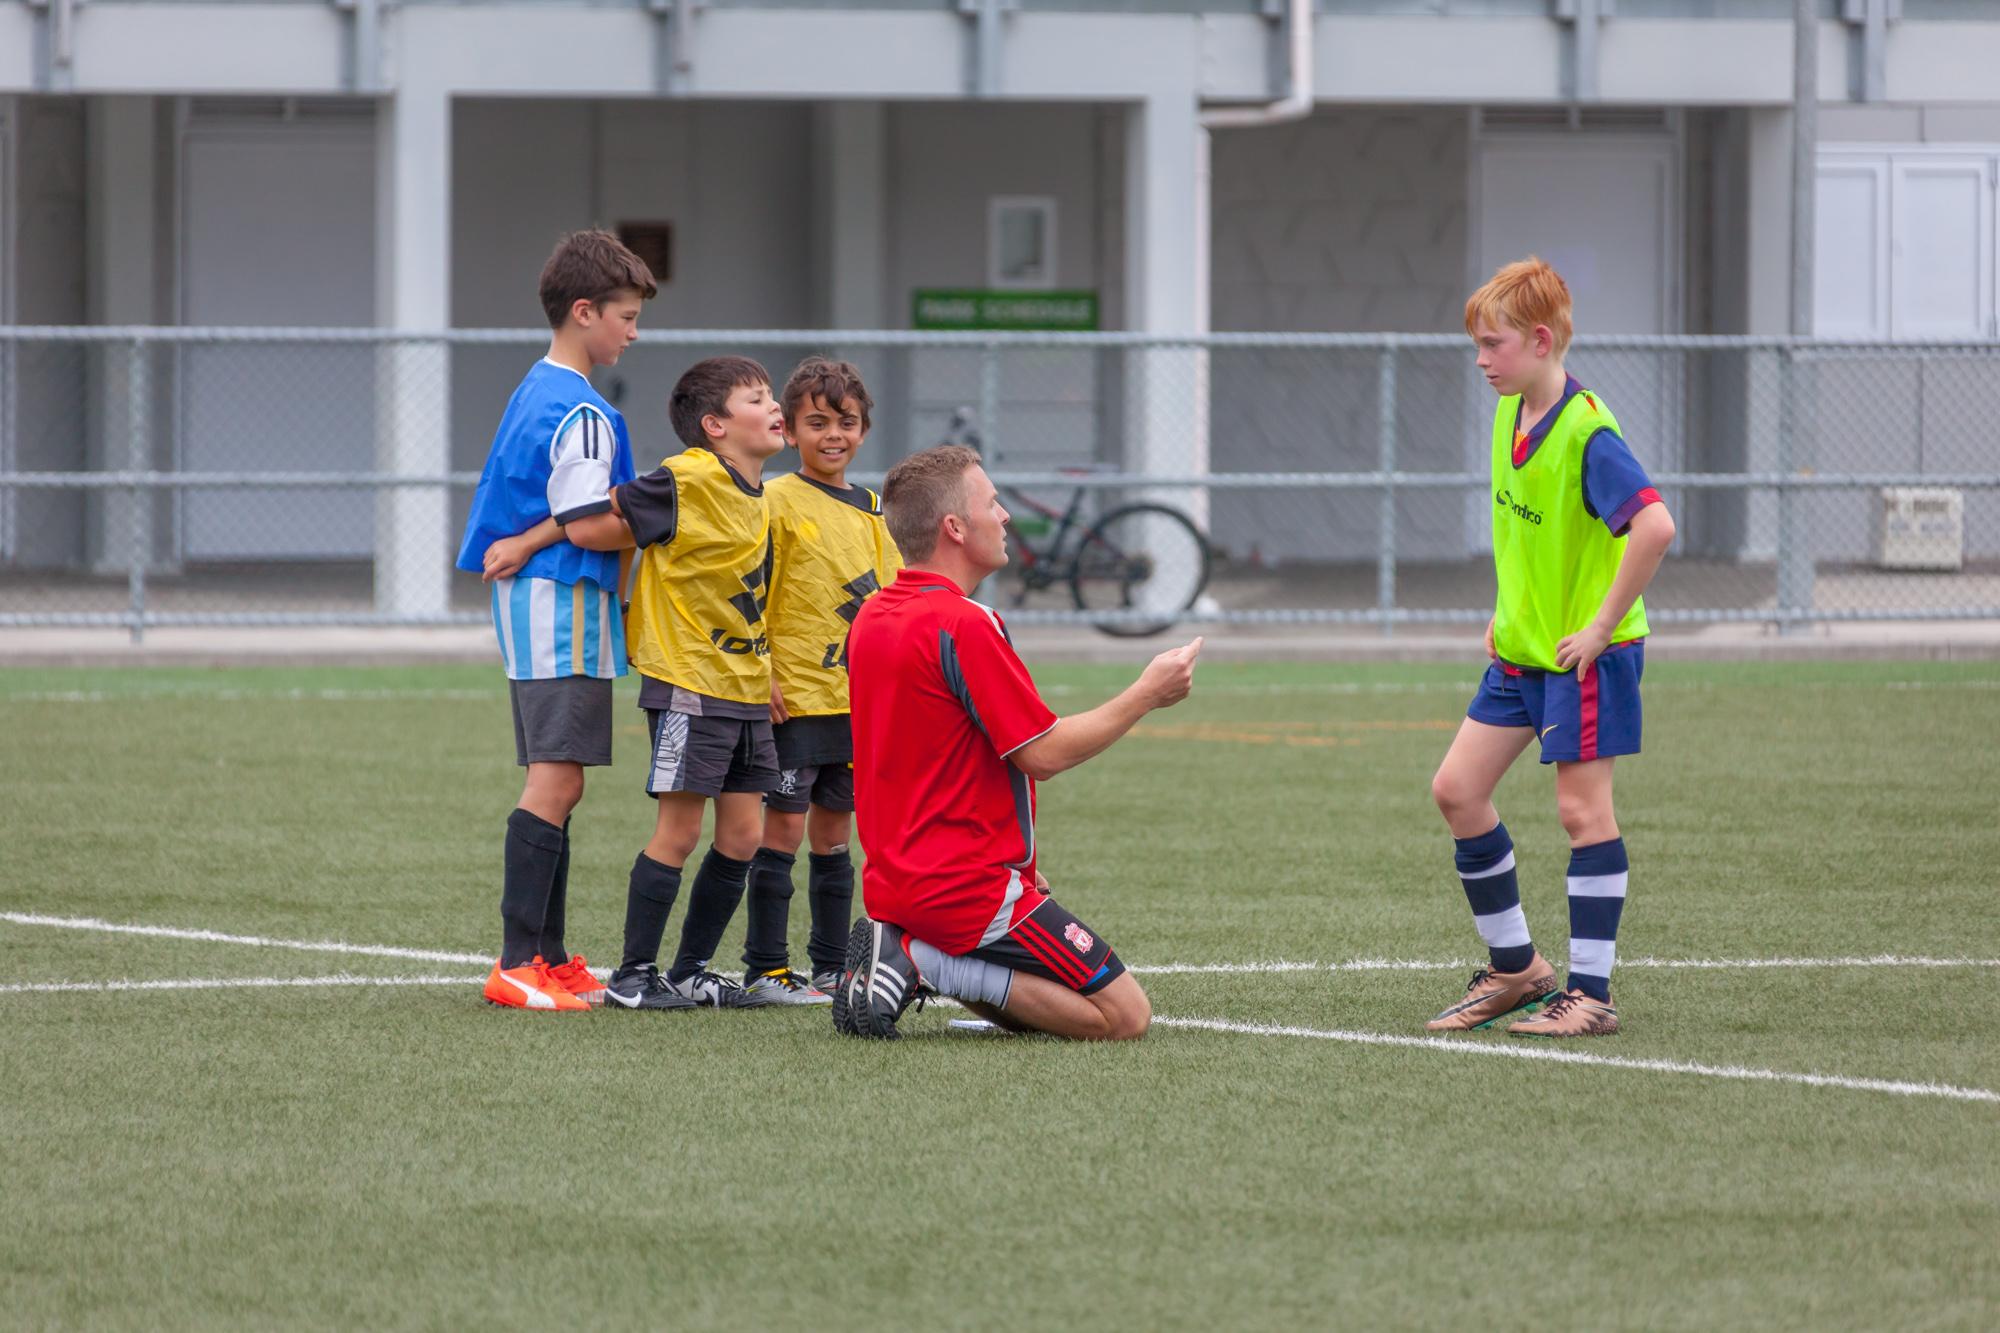 UHCC Soccer Coach 4433